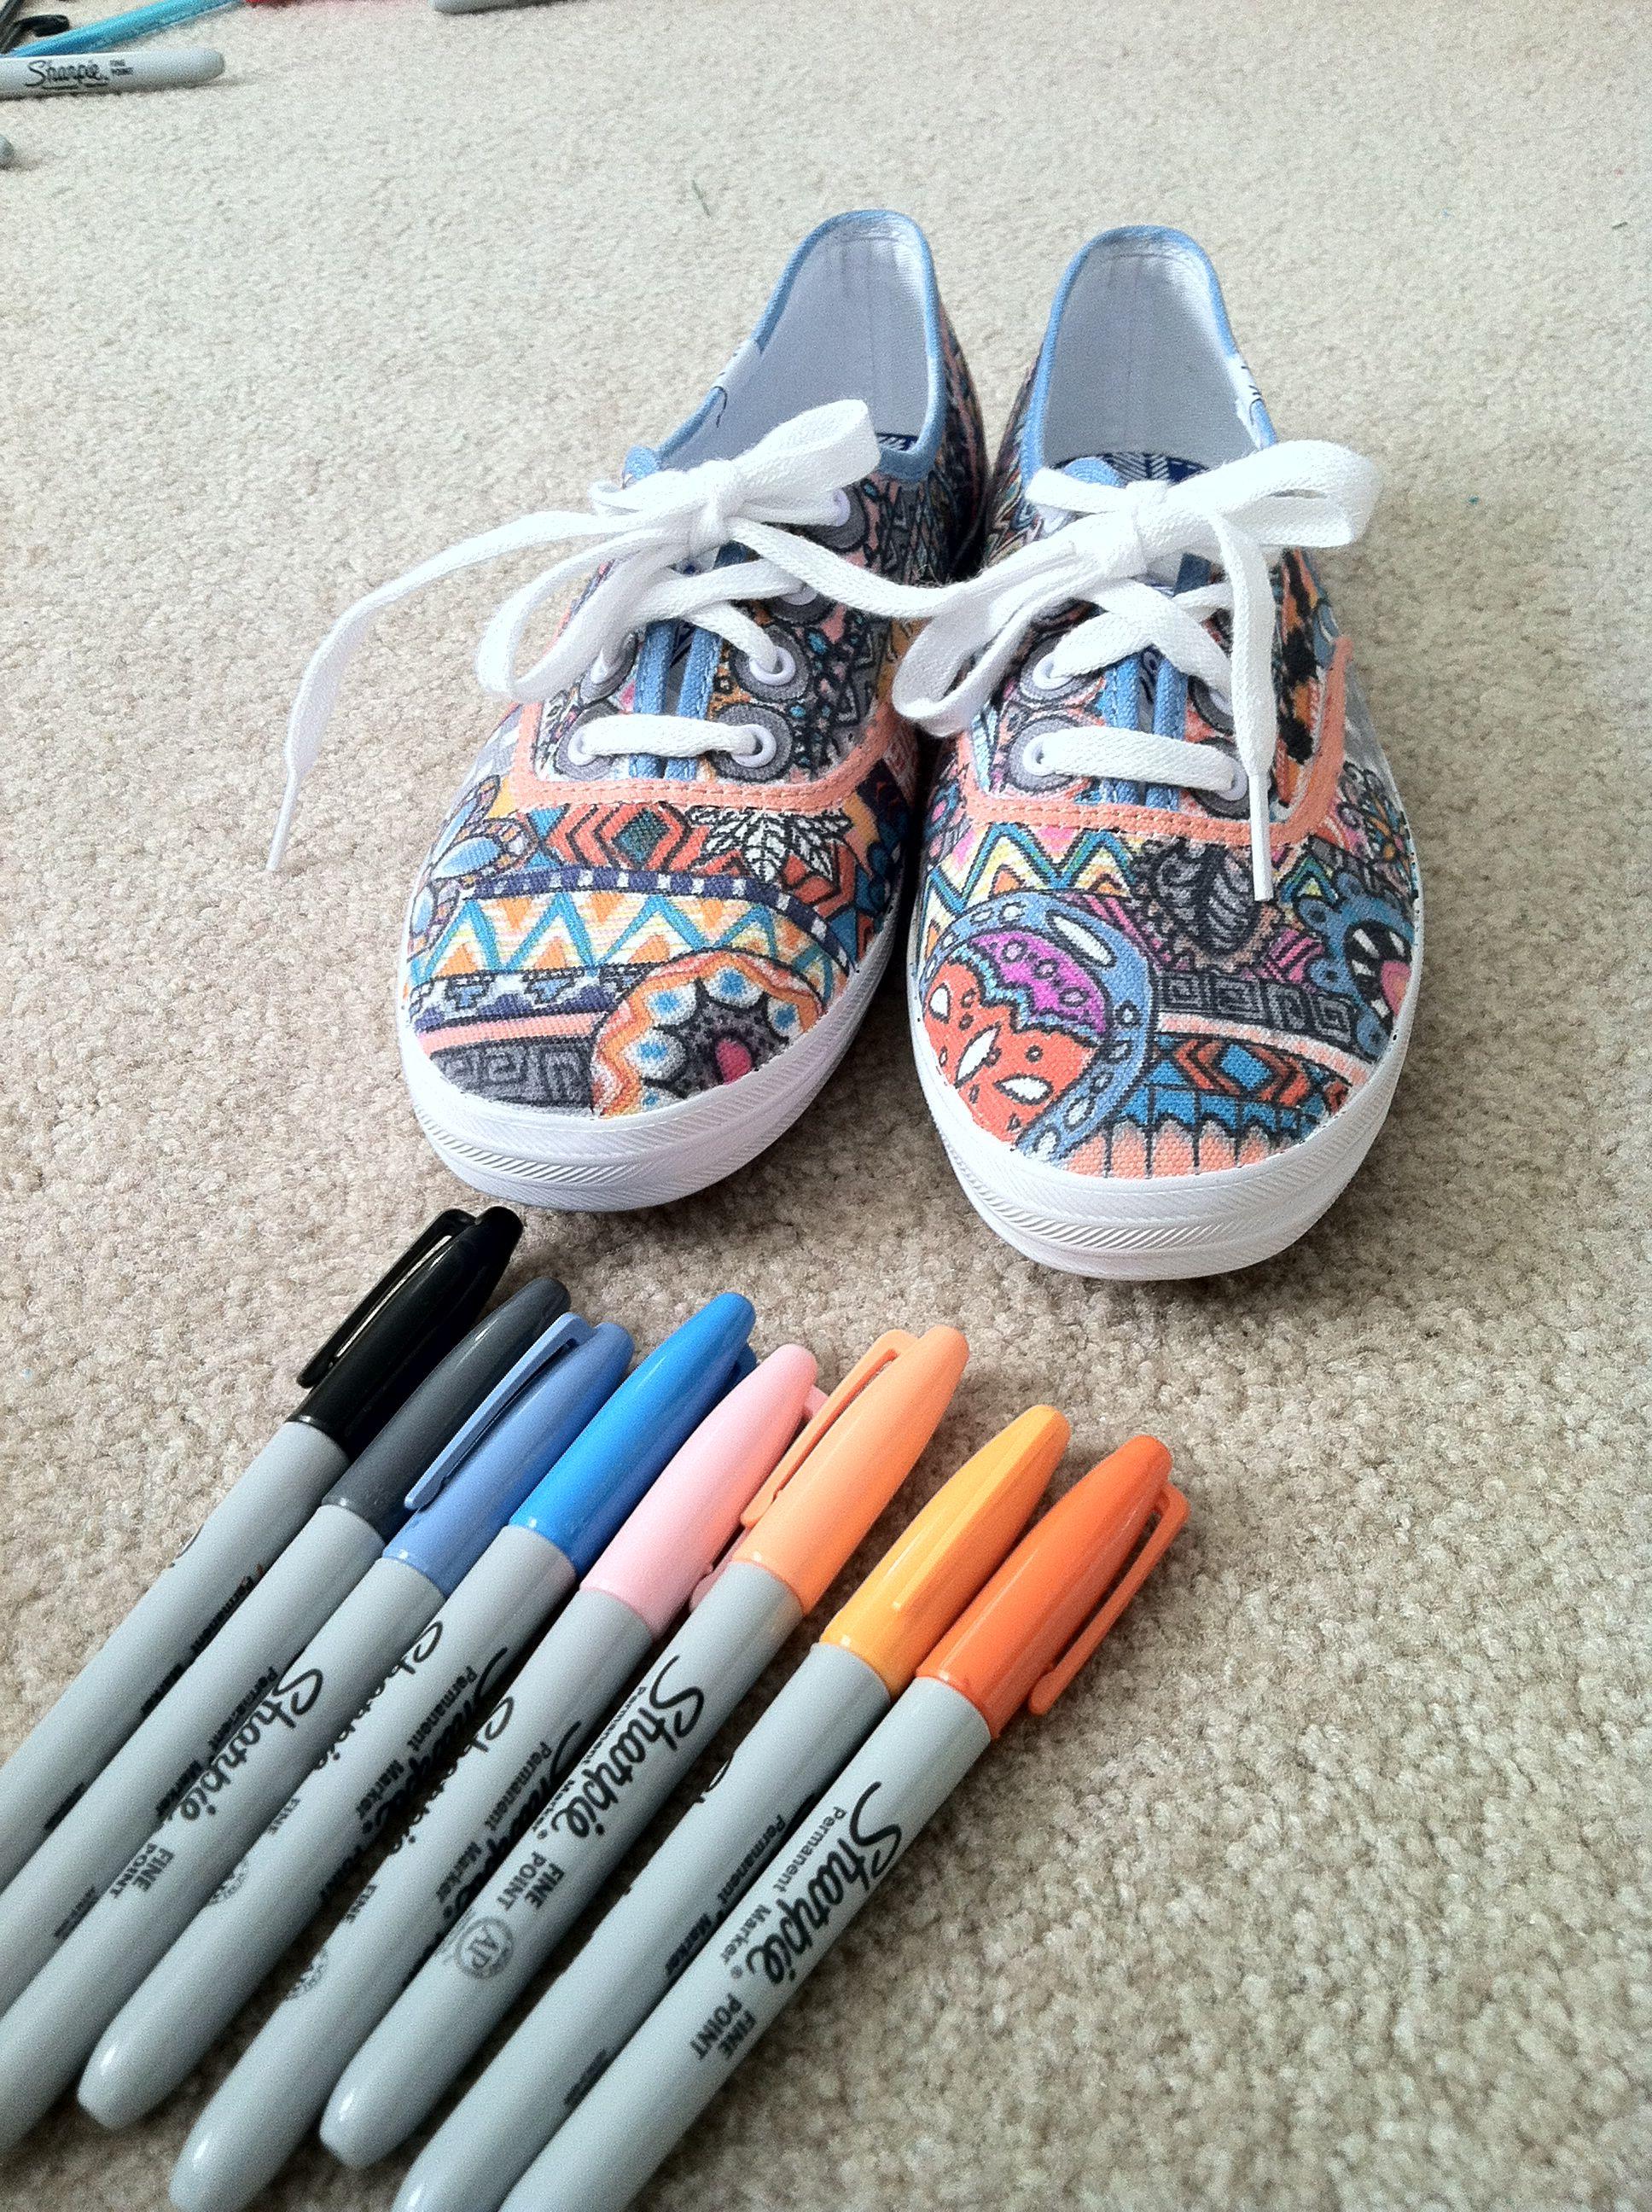 Diy sharpie shoes sharpie shoes diy sneakers diy shoes